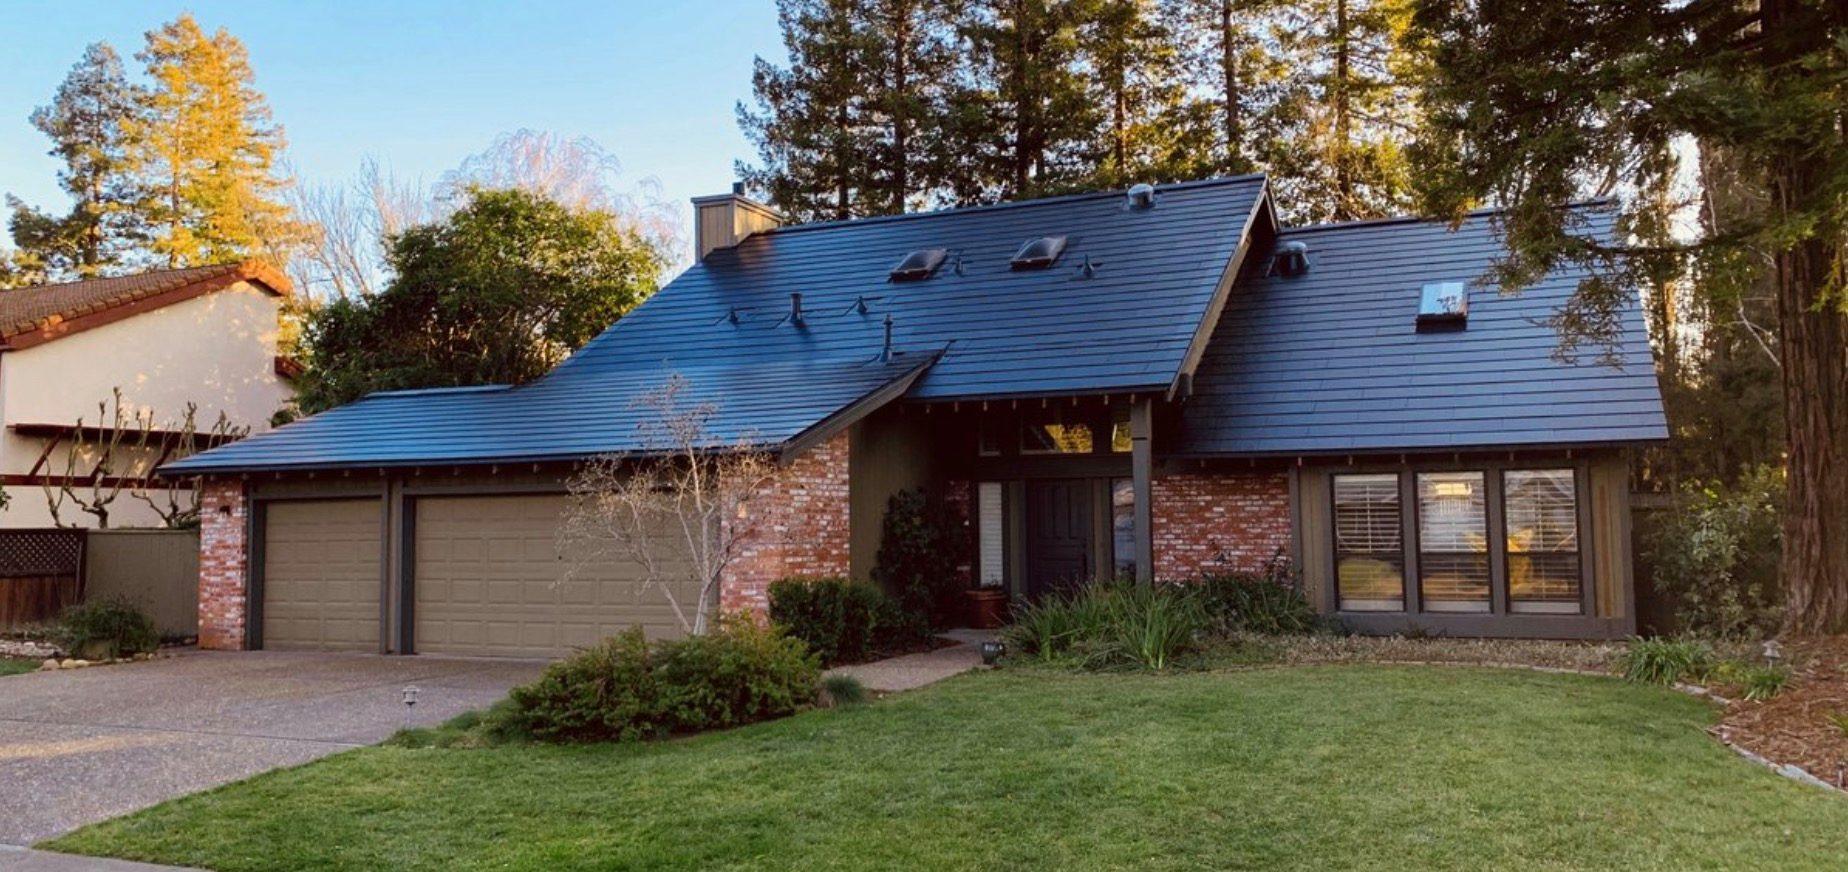 Elon Musk: Tesla's next 'killer product' solar roof